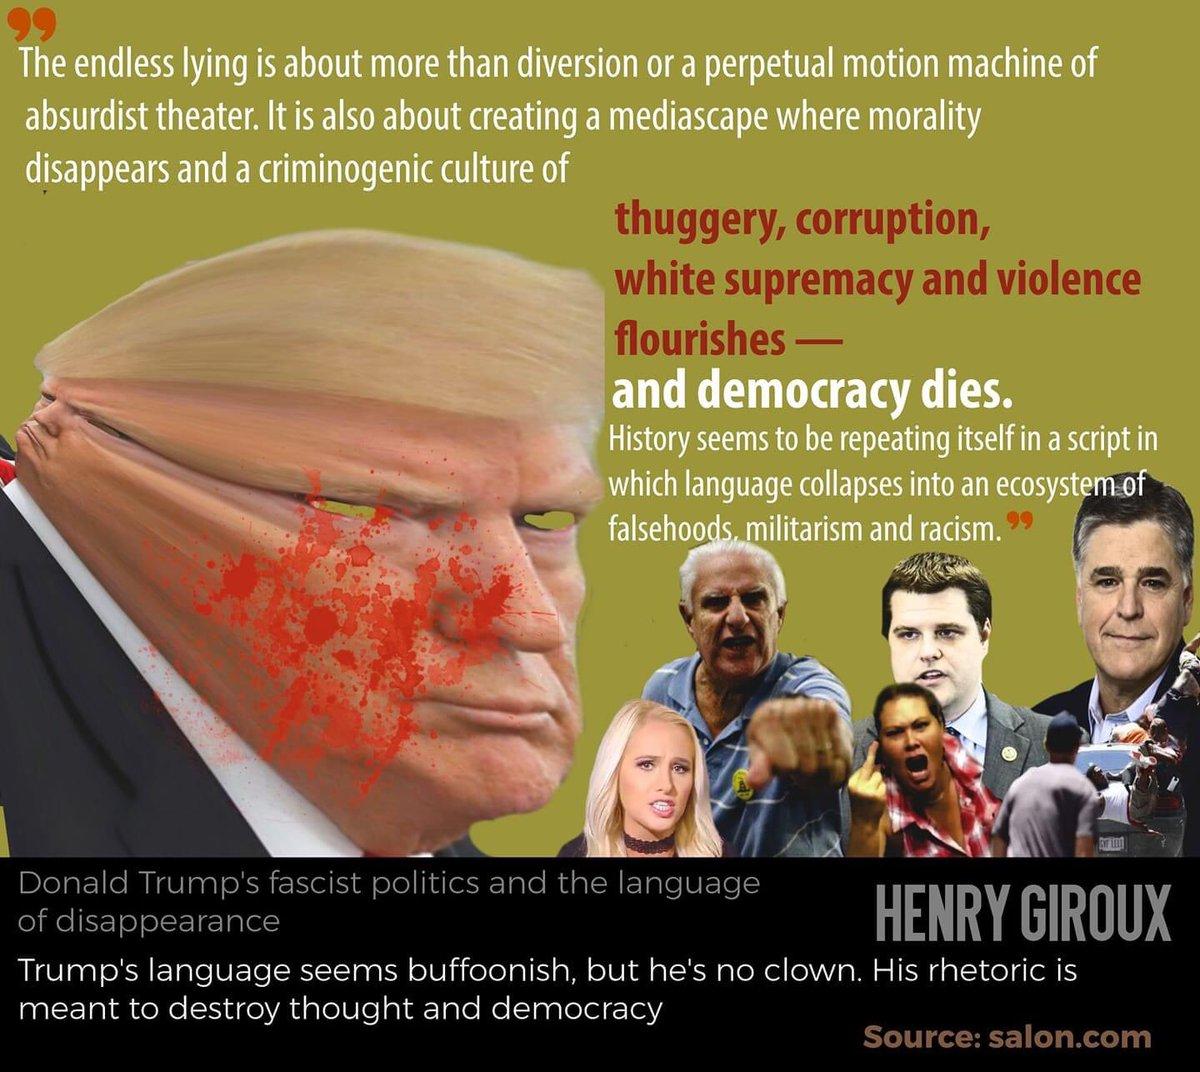 @HttR_MiMi #RemoveBarr #ResignNowTrump #RepuglicansAreComplicit #FireStephenMiller #CloseTheConcentrationCampsNow #JailTheTrumpMob #NoExoneration #EndTheCoverup #ChargeNunes #EndTheRatfuckingNow